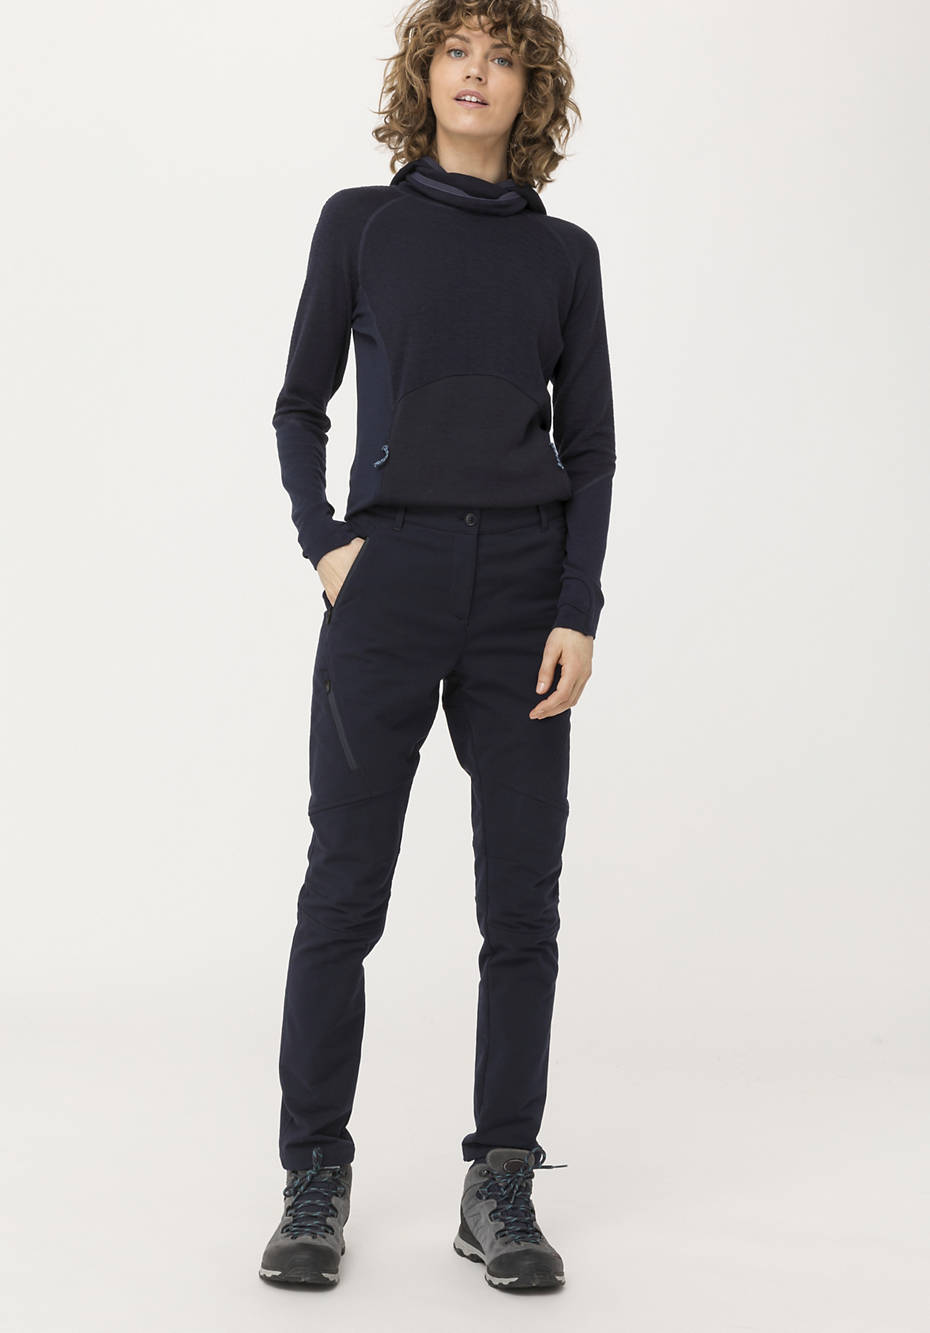 Softshell pants slim fit made of organic cotton